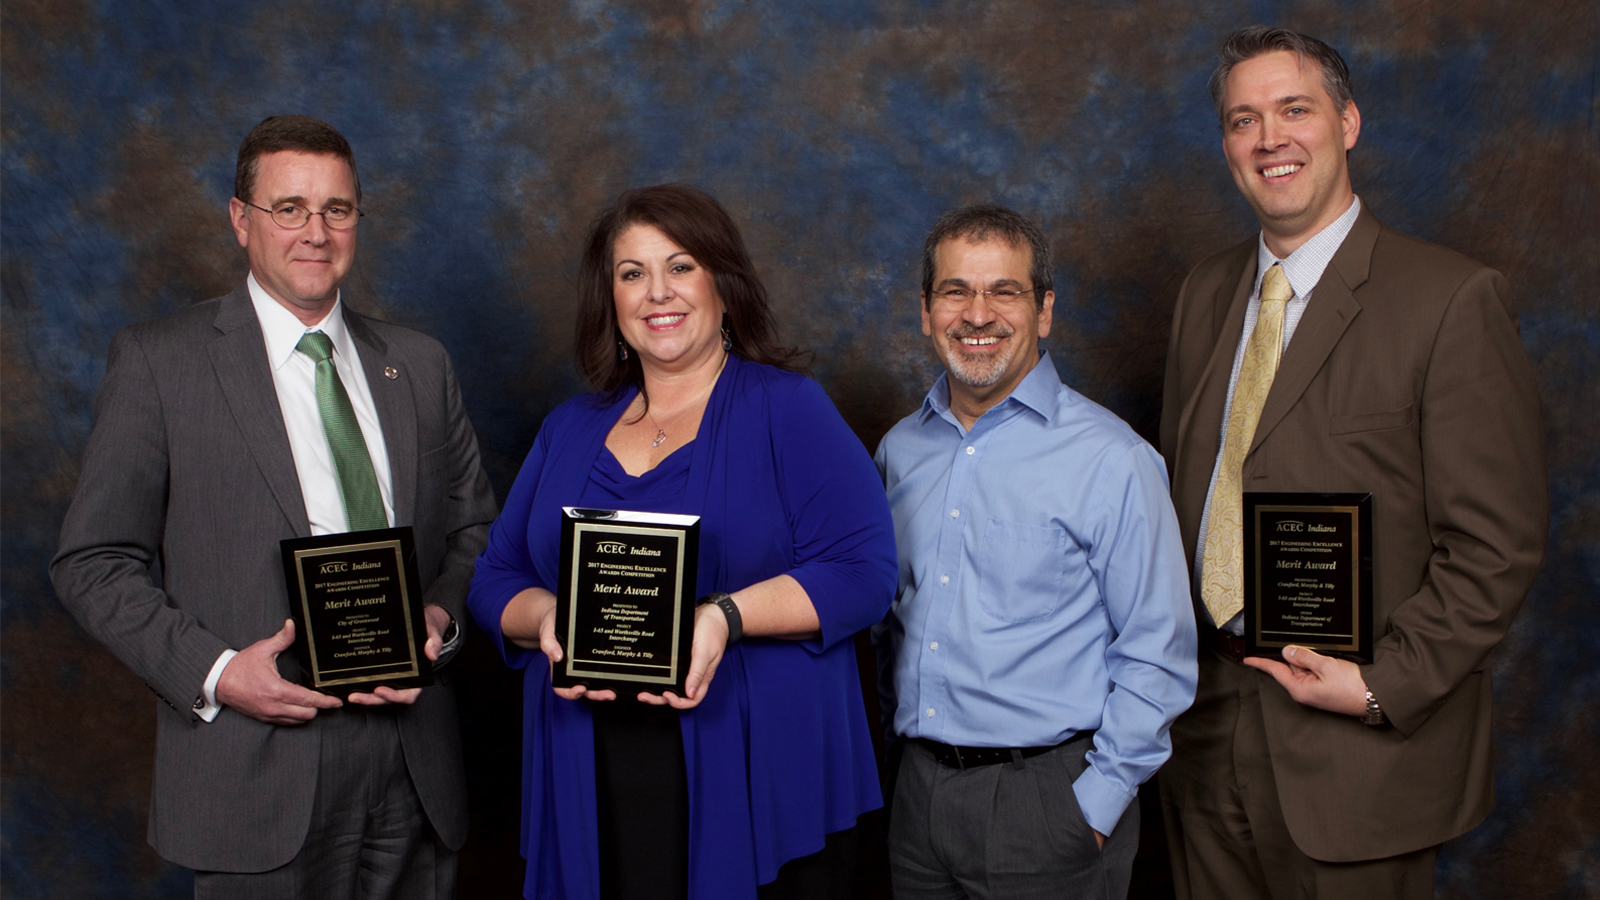 ACEC Indiana Award Ceremony